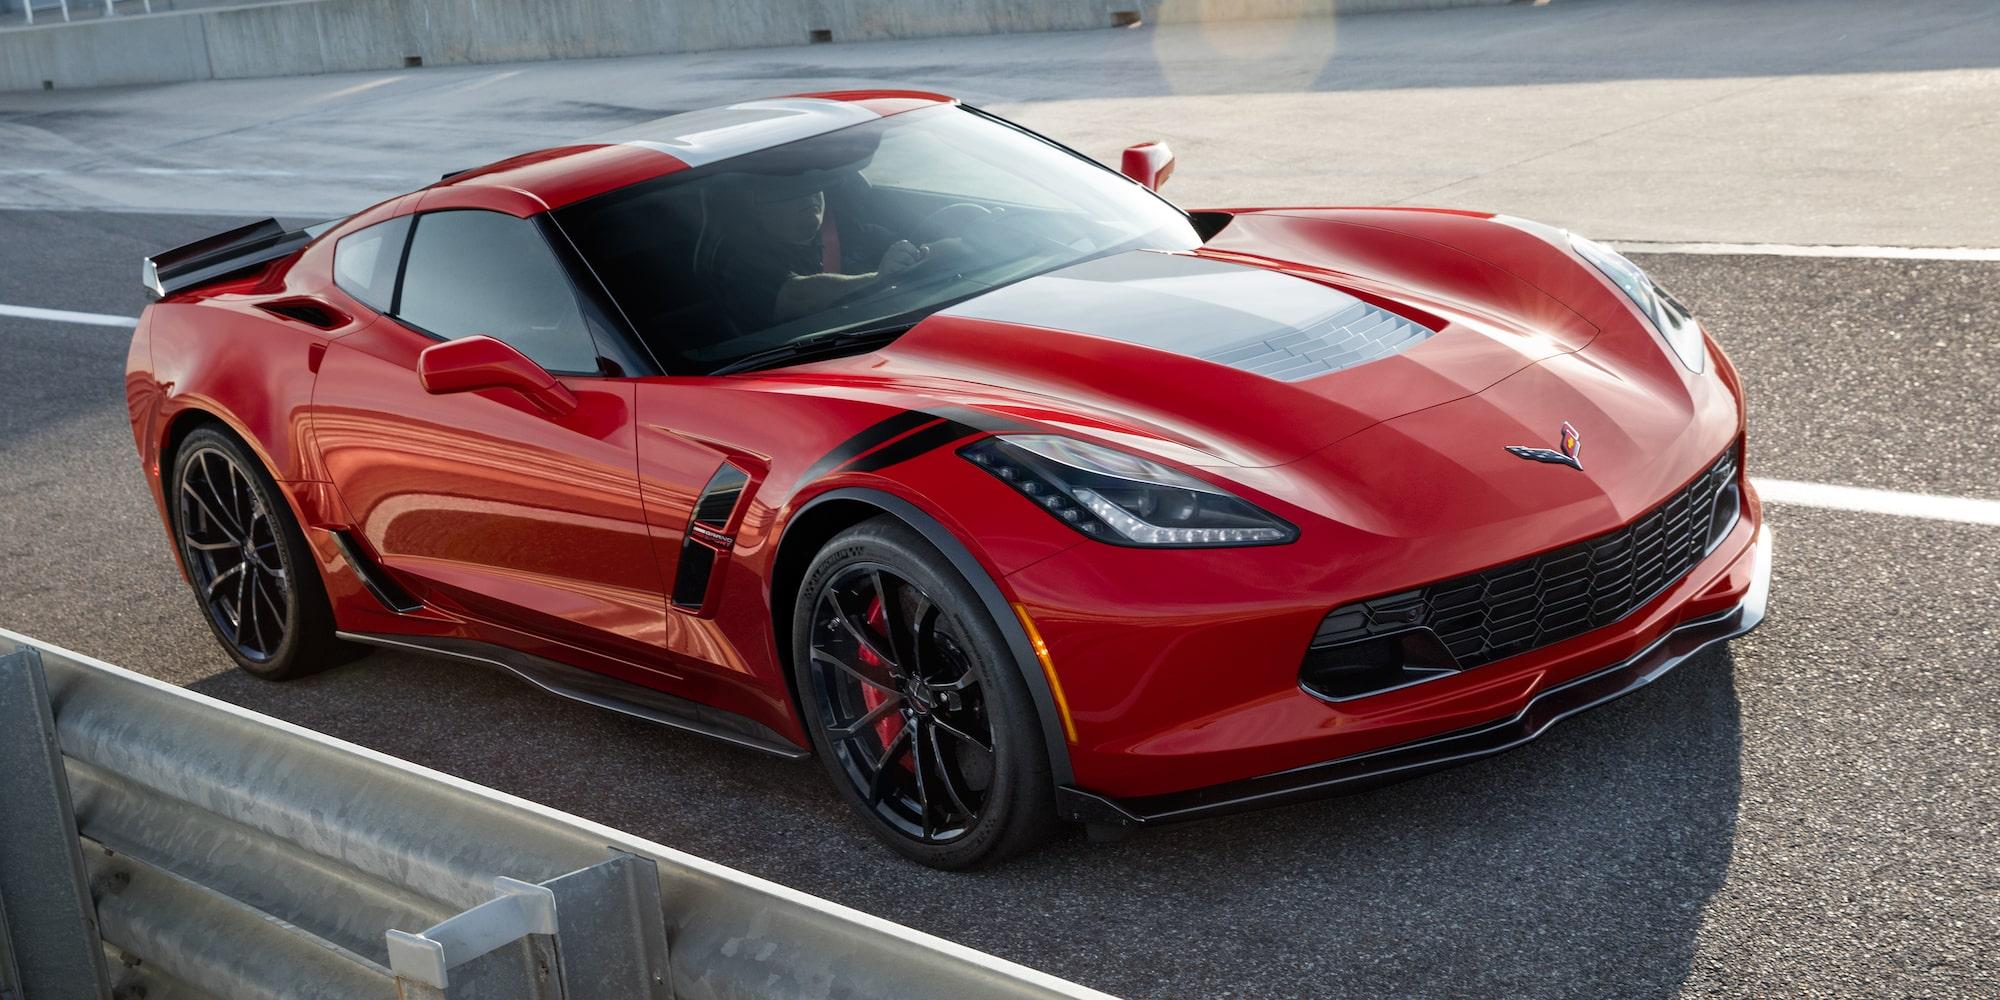 2019 Corvette Grand Sport Sports Car Design: Front